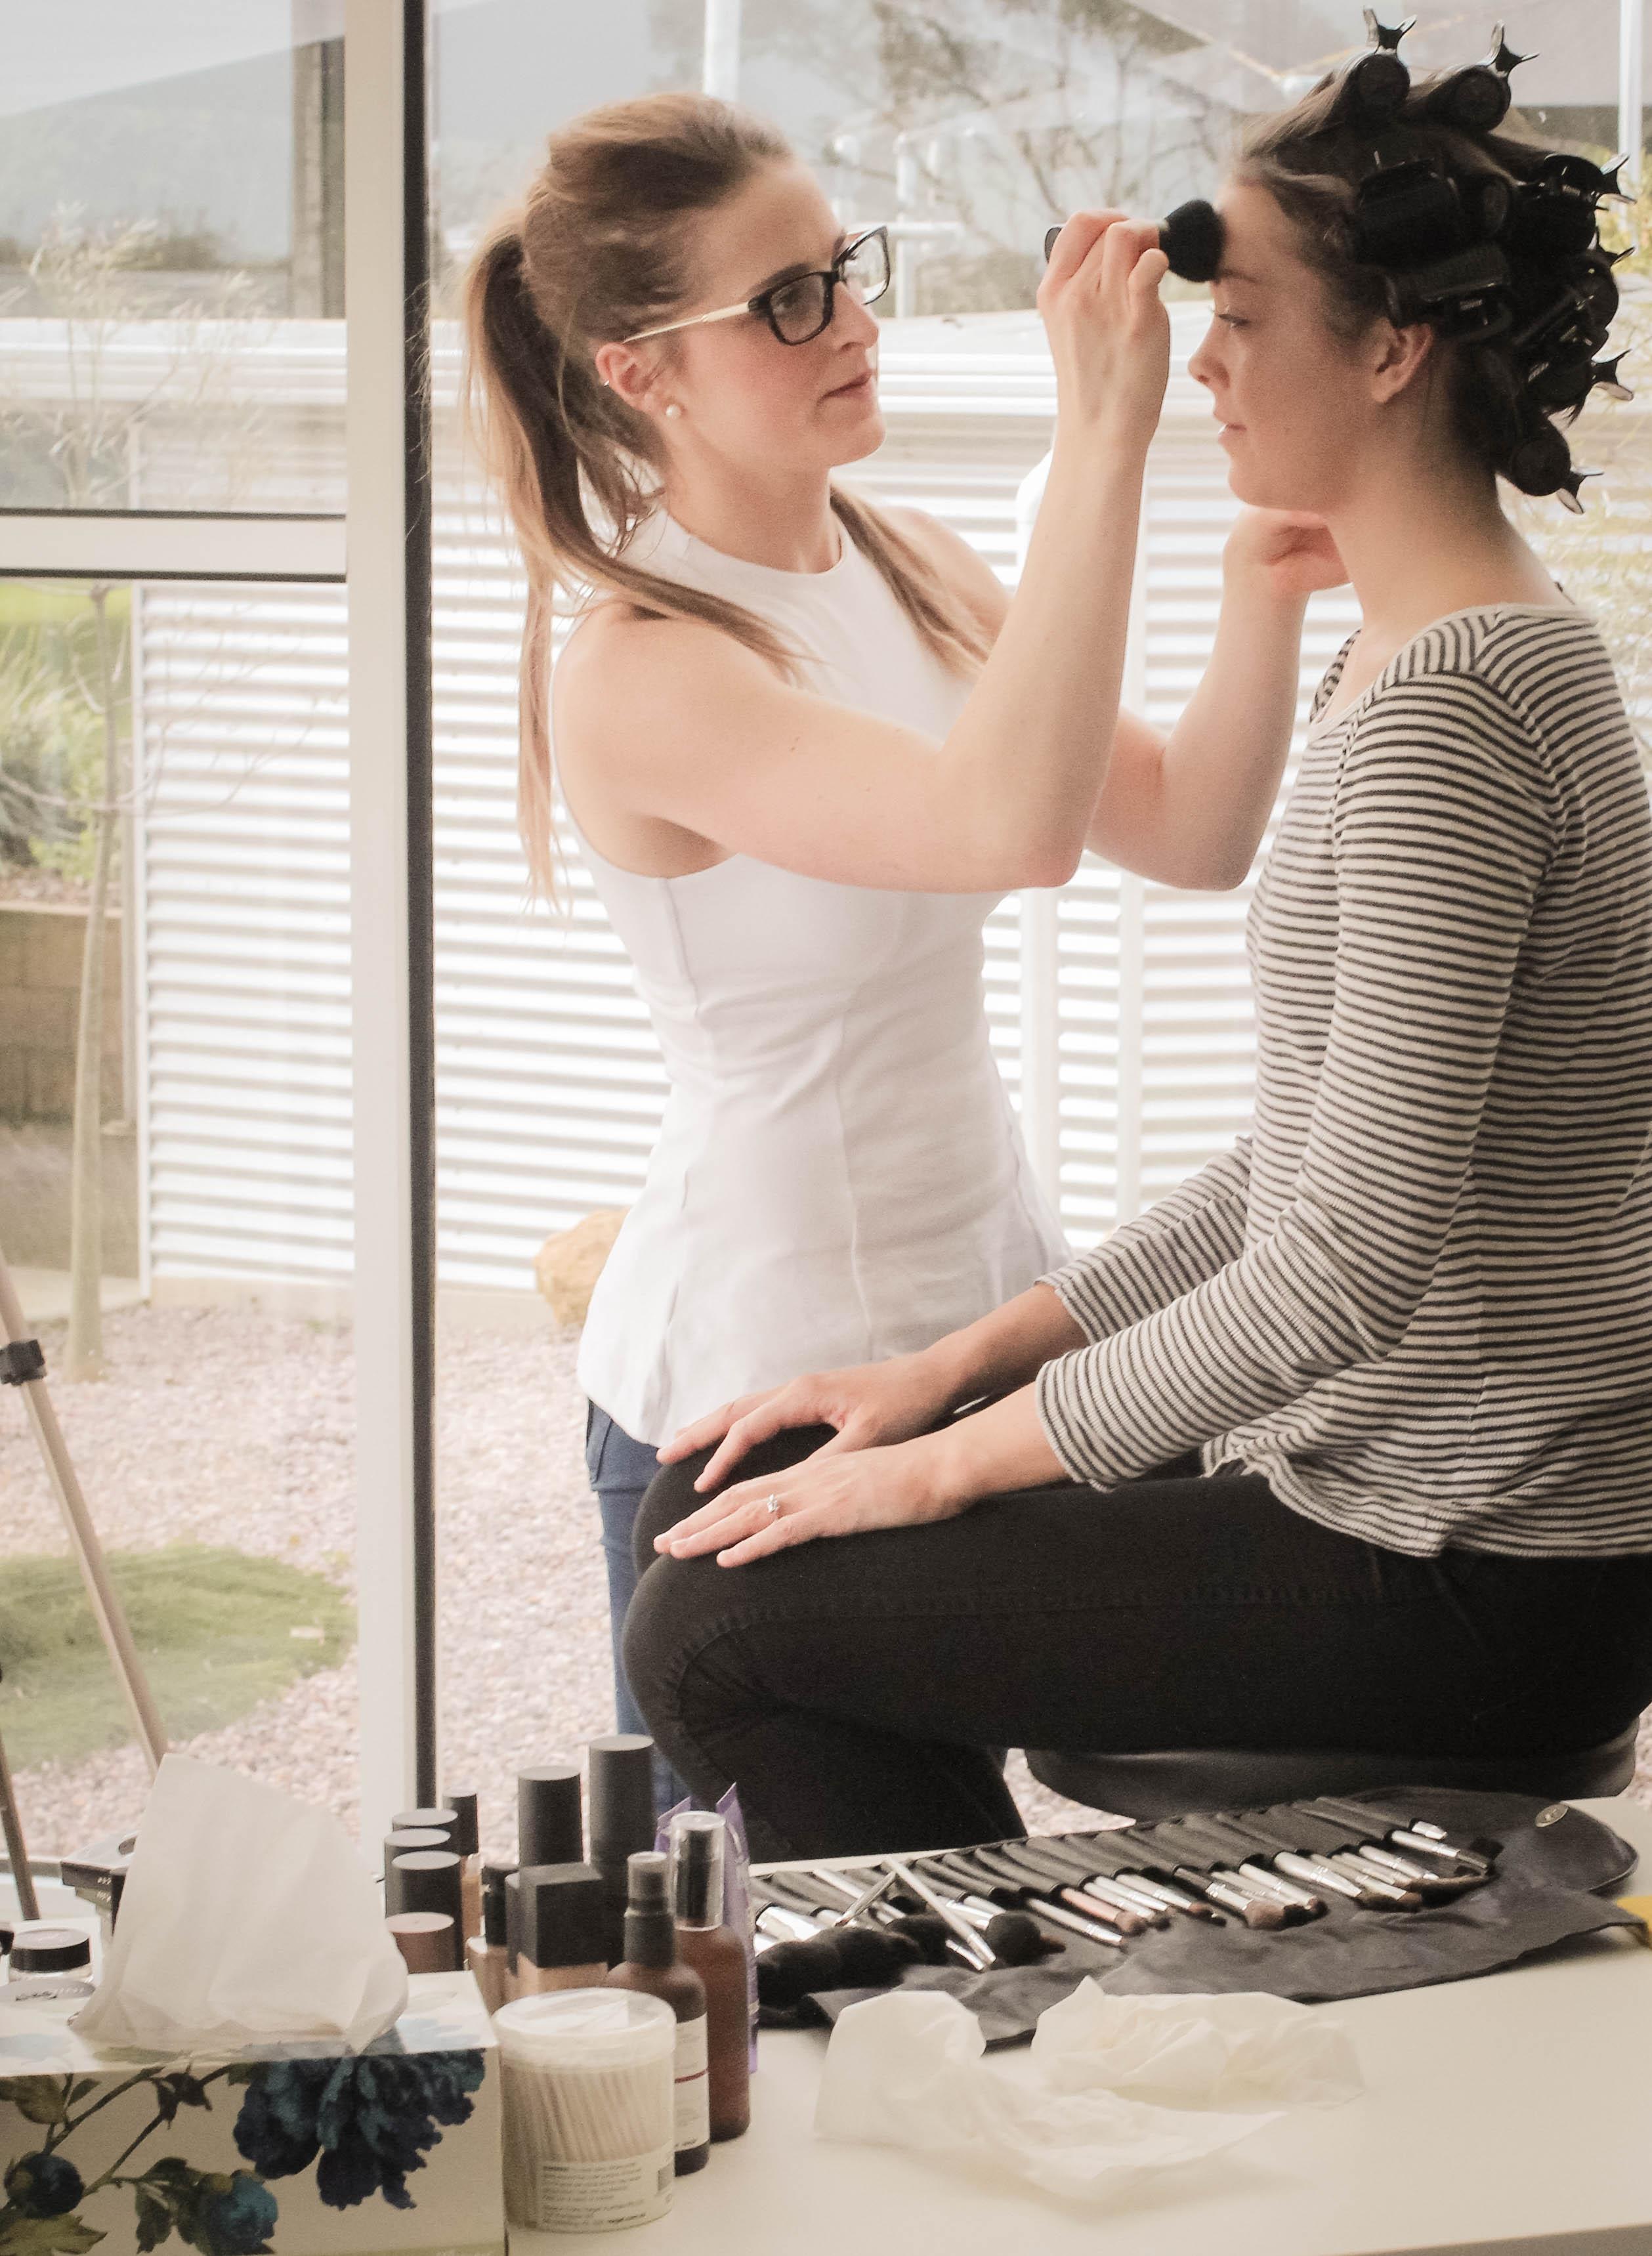 Warrnambool Wedding Vendors: Makeup by Sarah